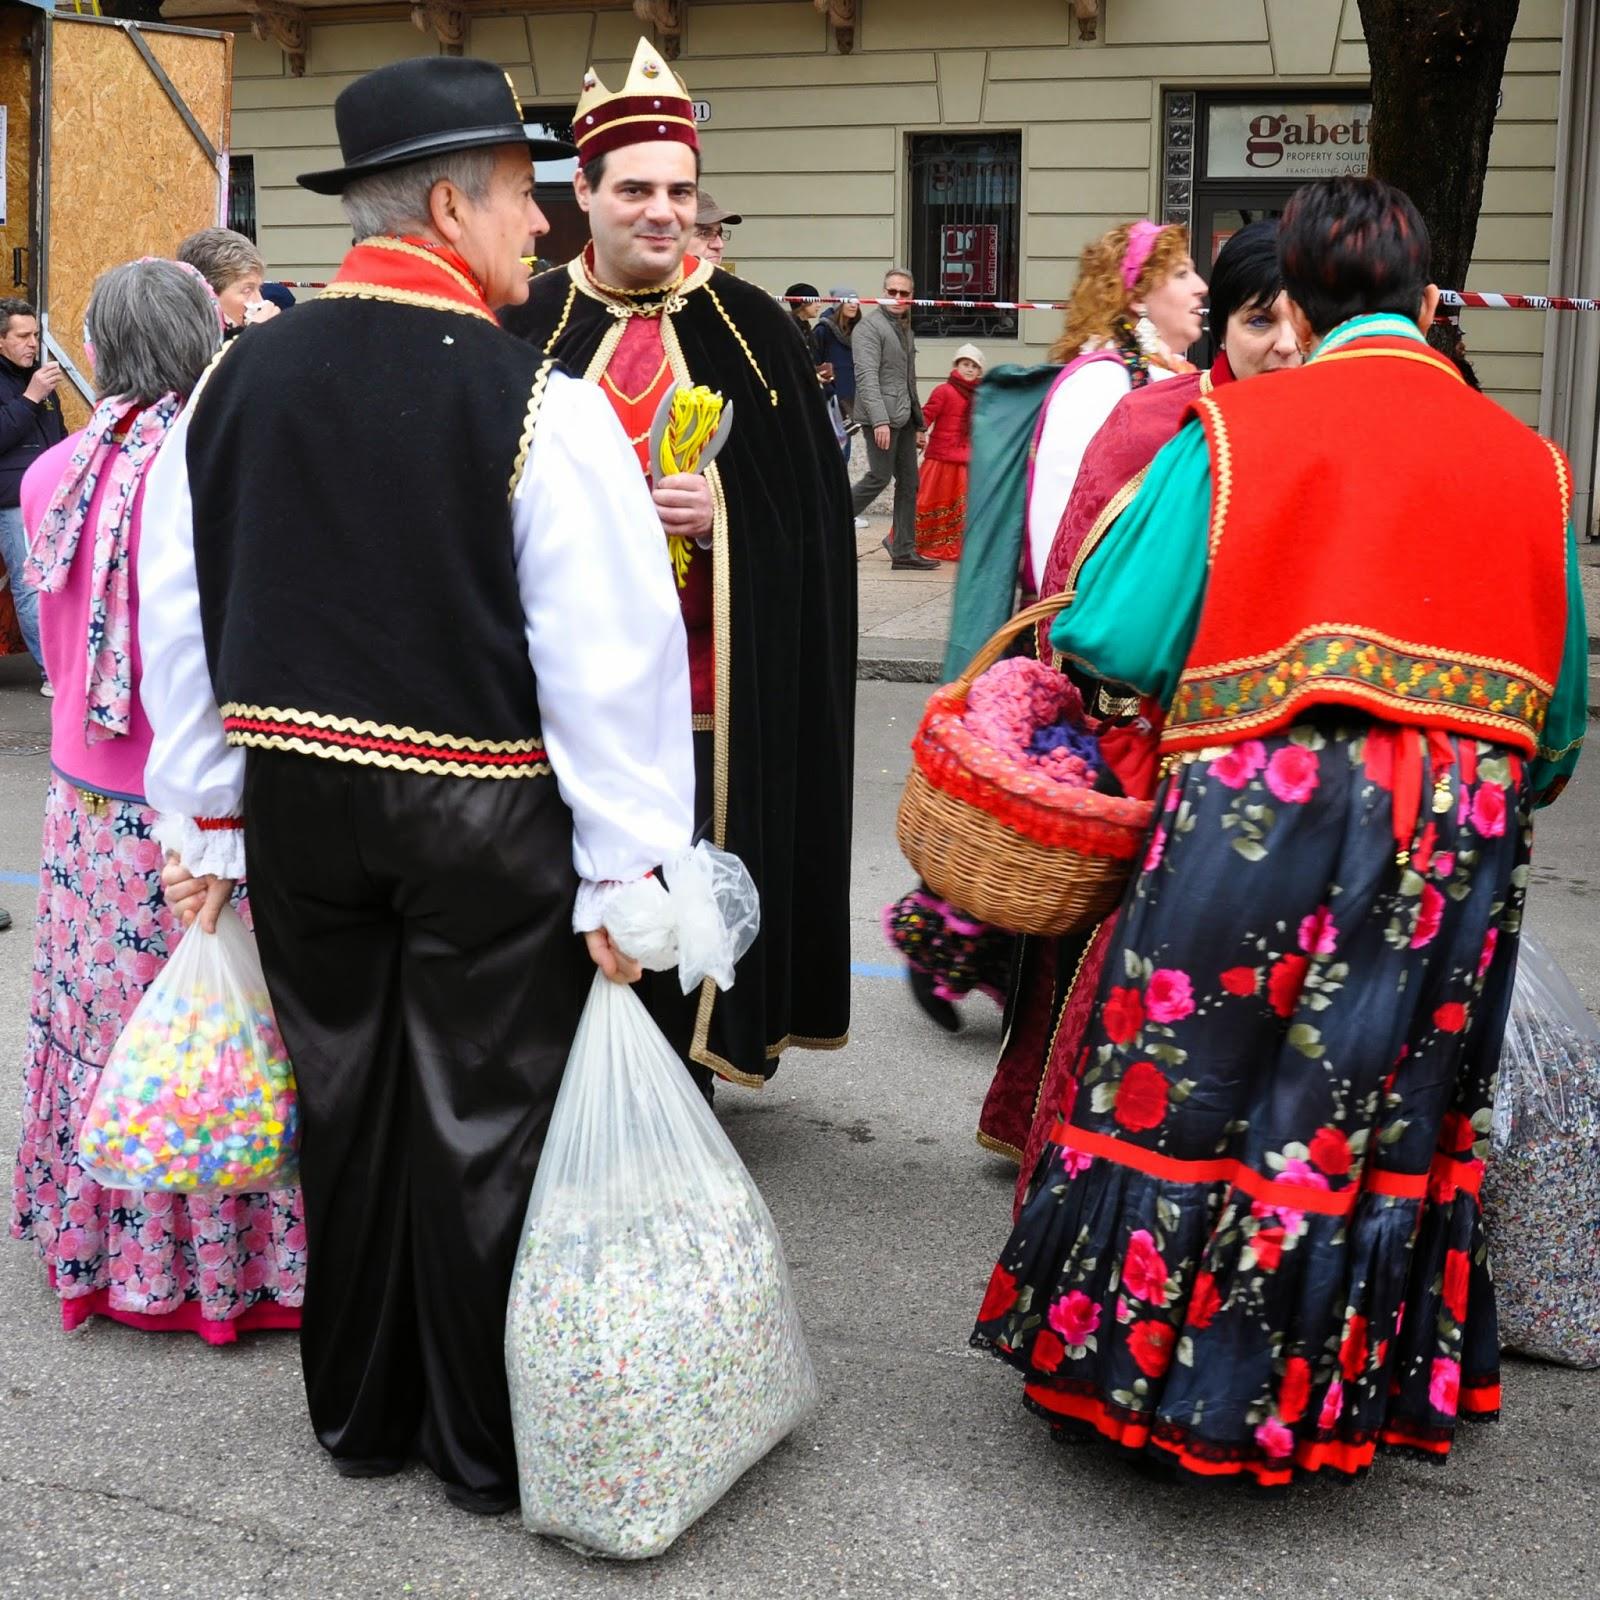 People in costume waiting for the parade in Verona on Venerdi Gnocolar to start